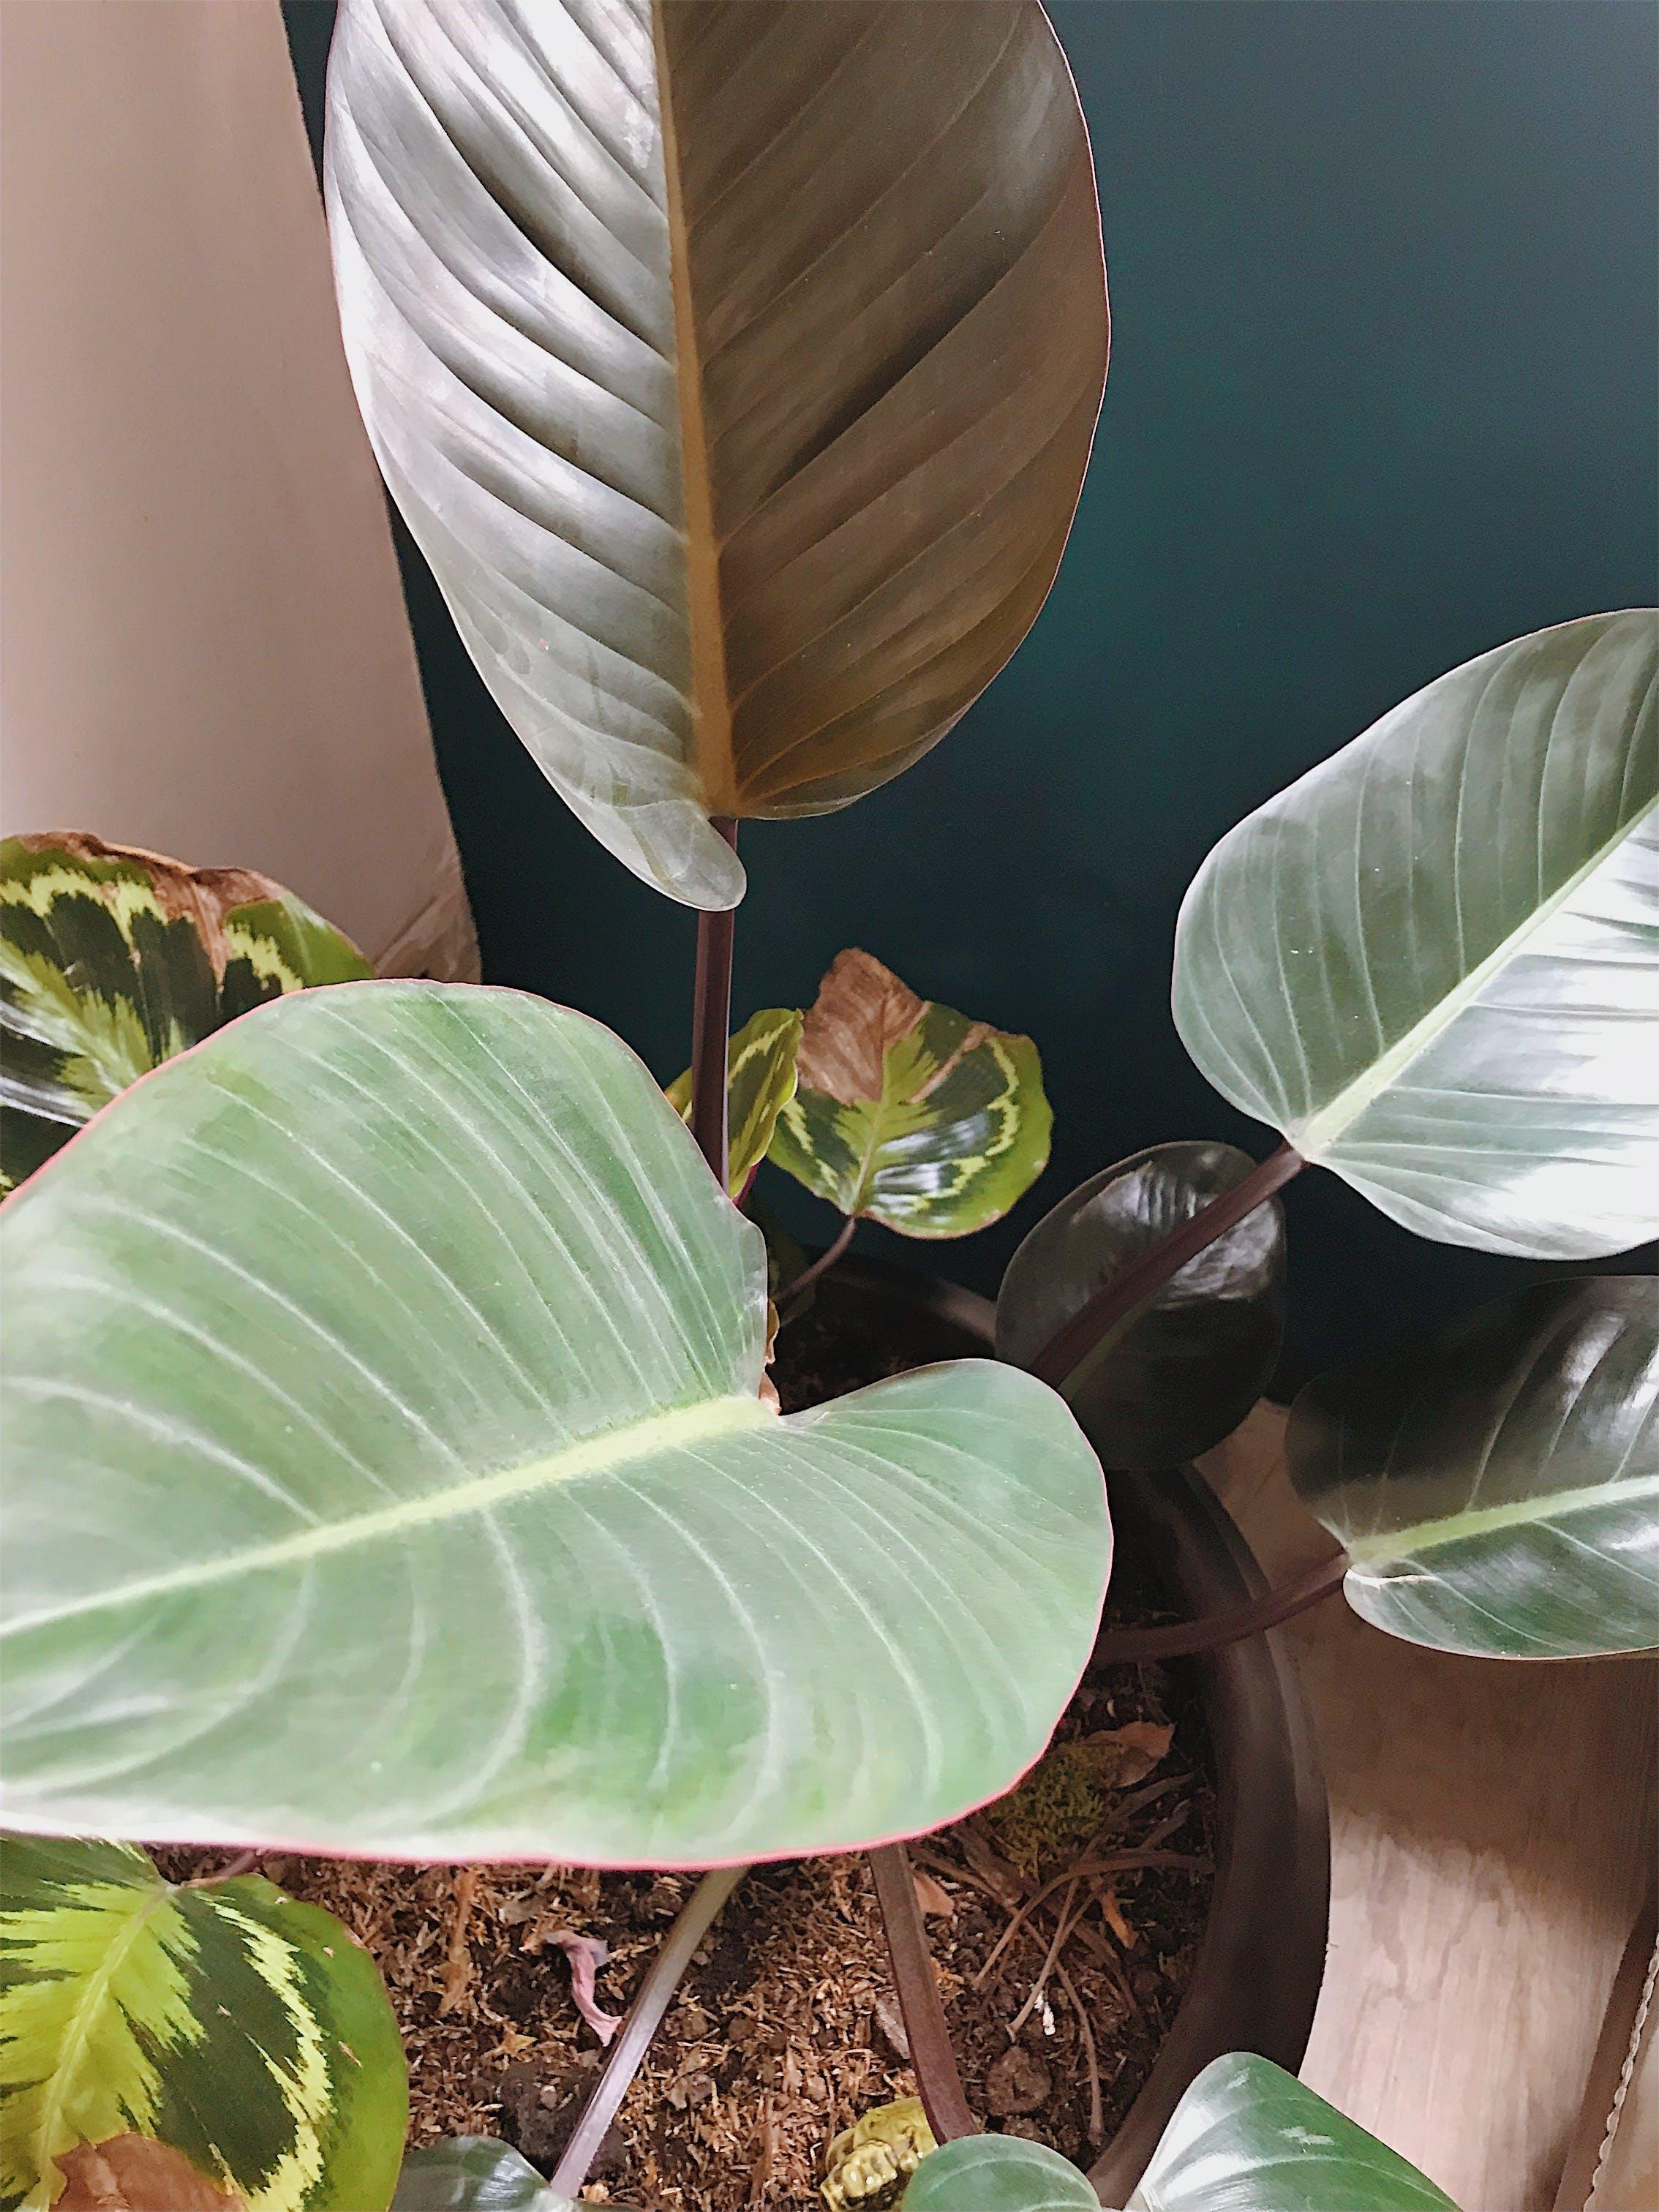 Free stock photo of nature, flowers, green, interior